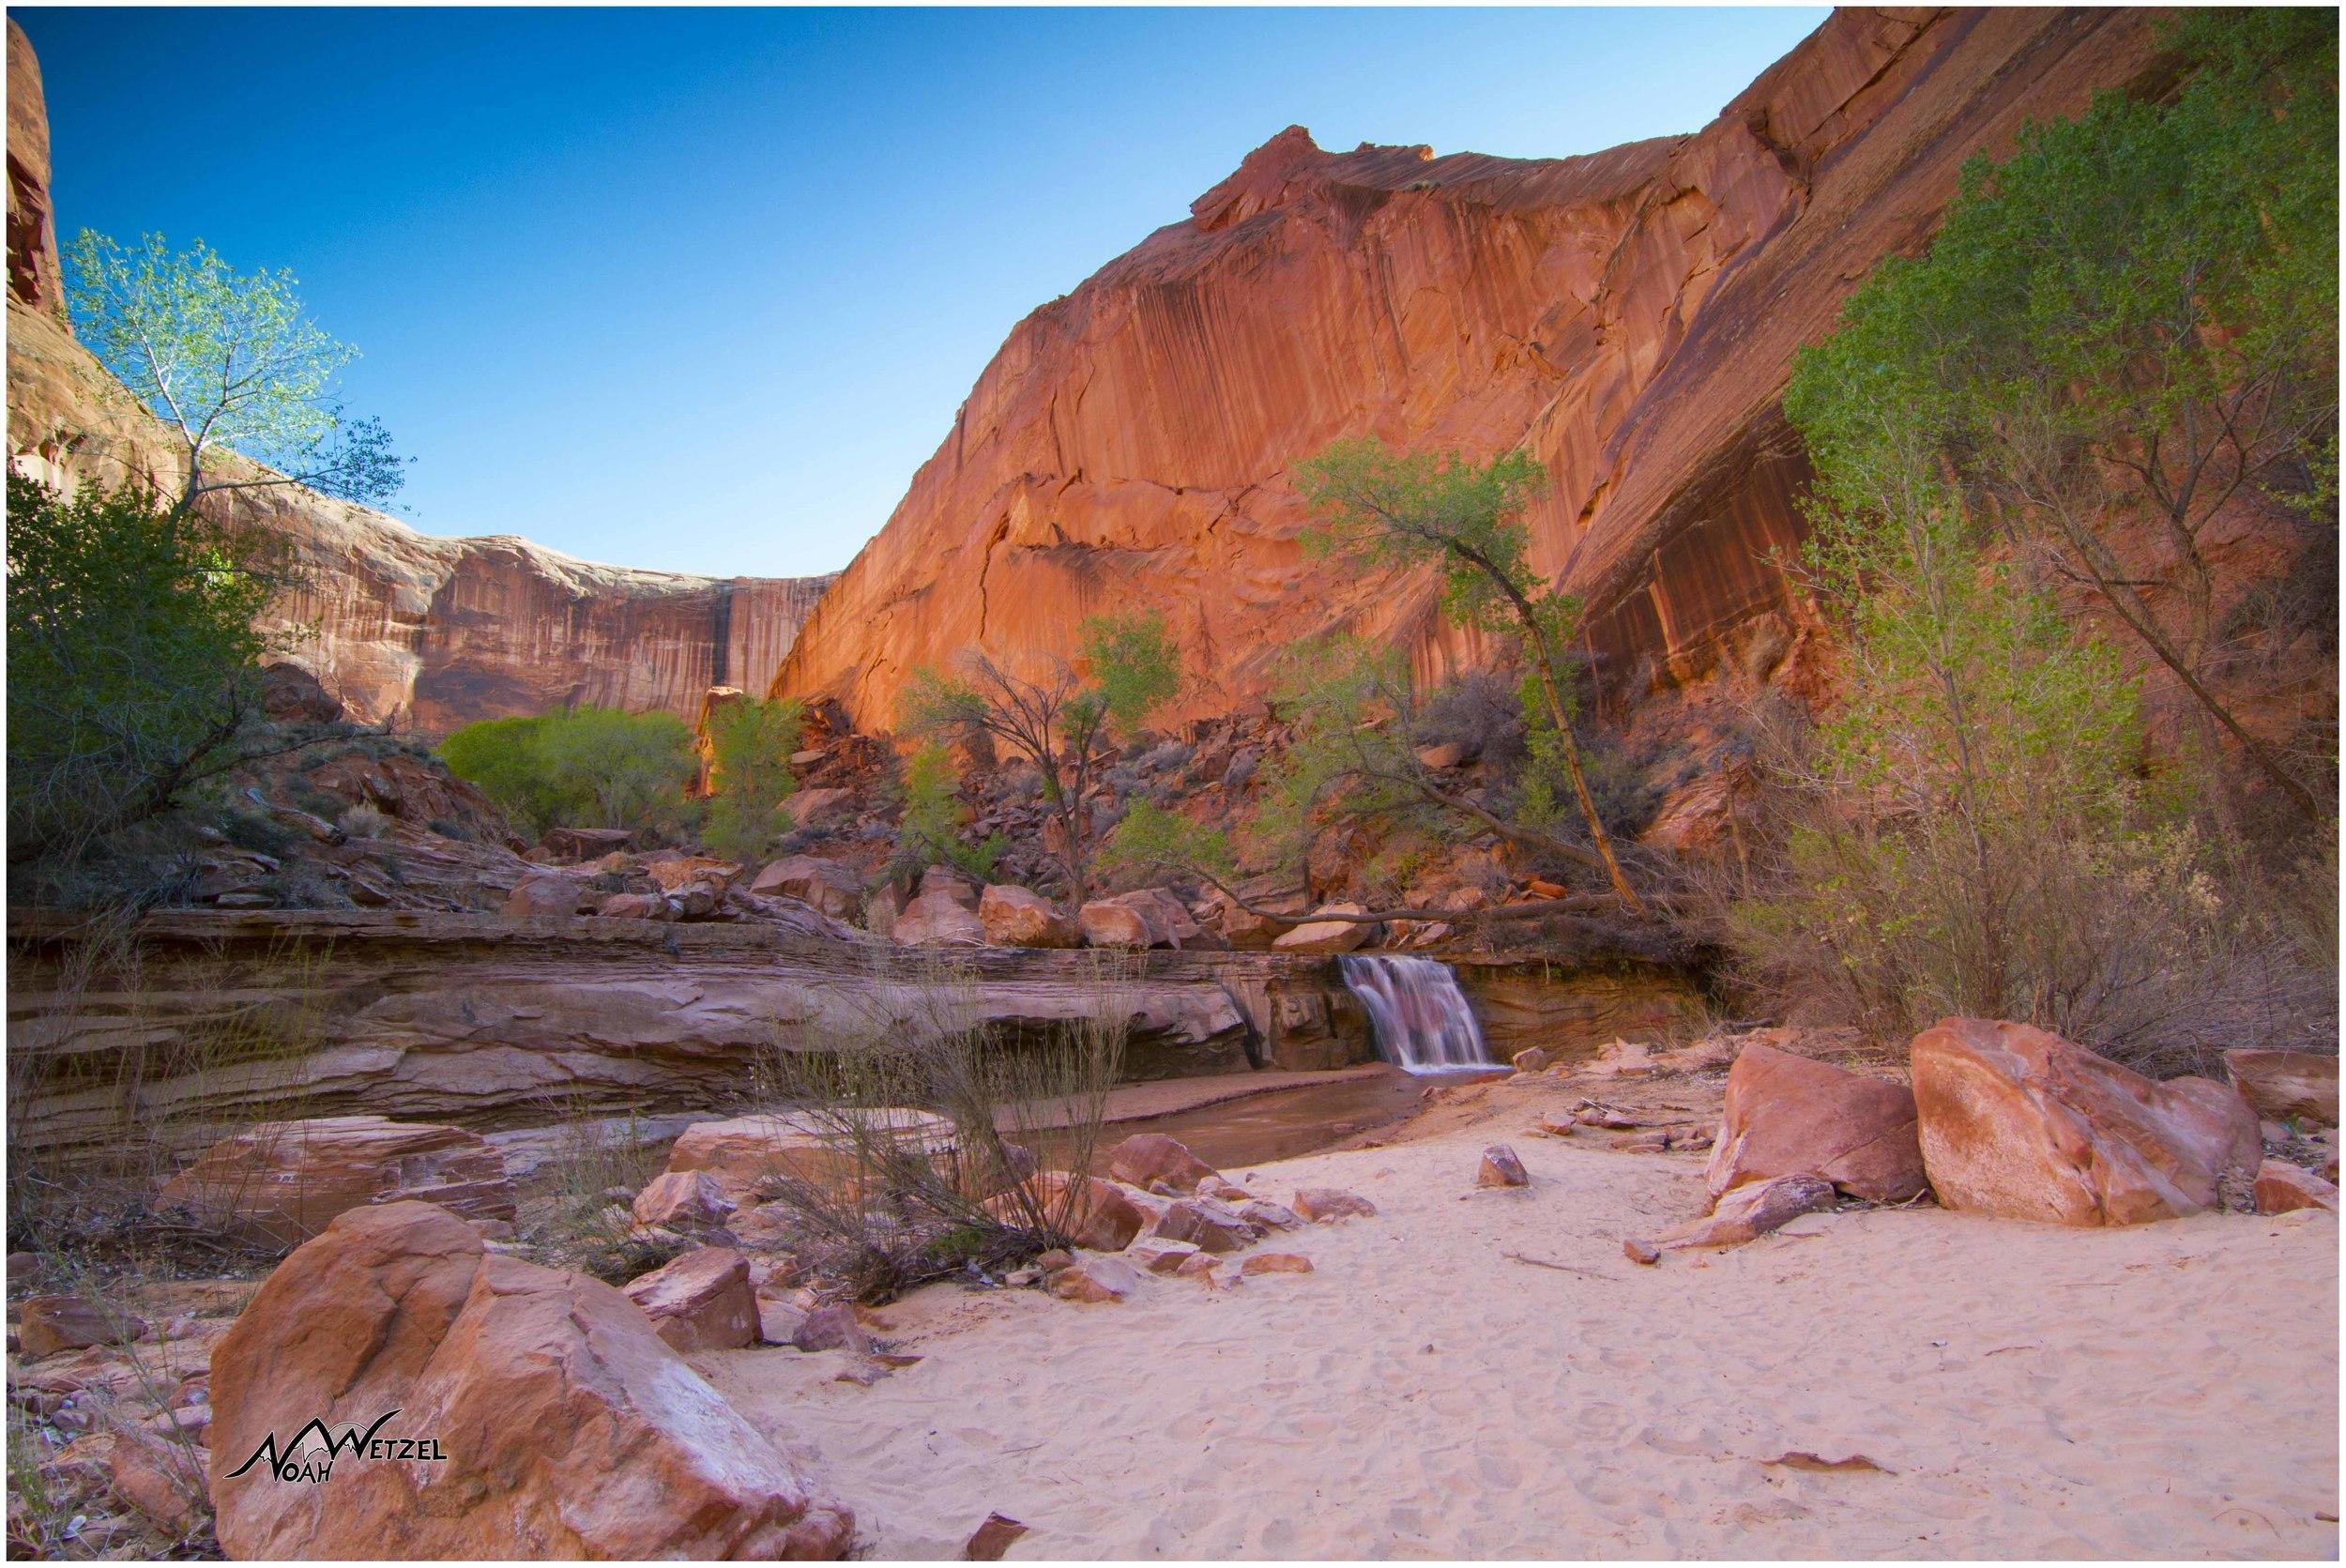 Waterfall Oasis. Coyote Gulch. Escalante, Utah